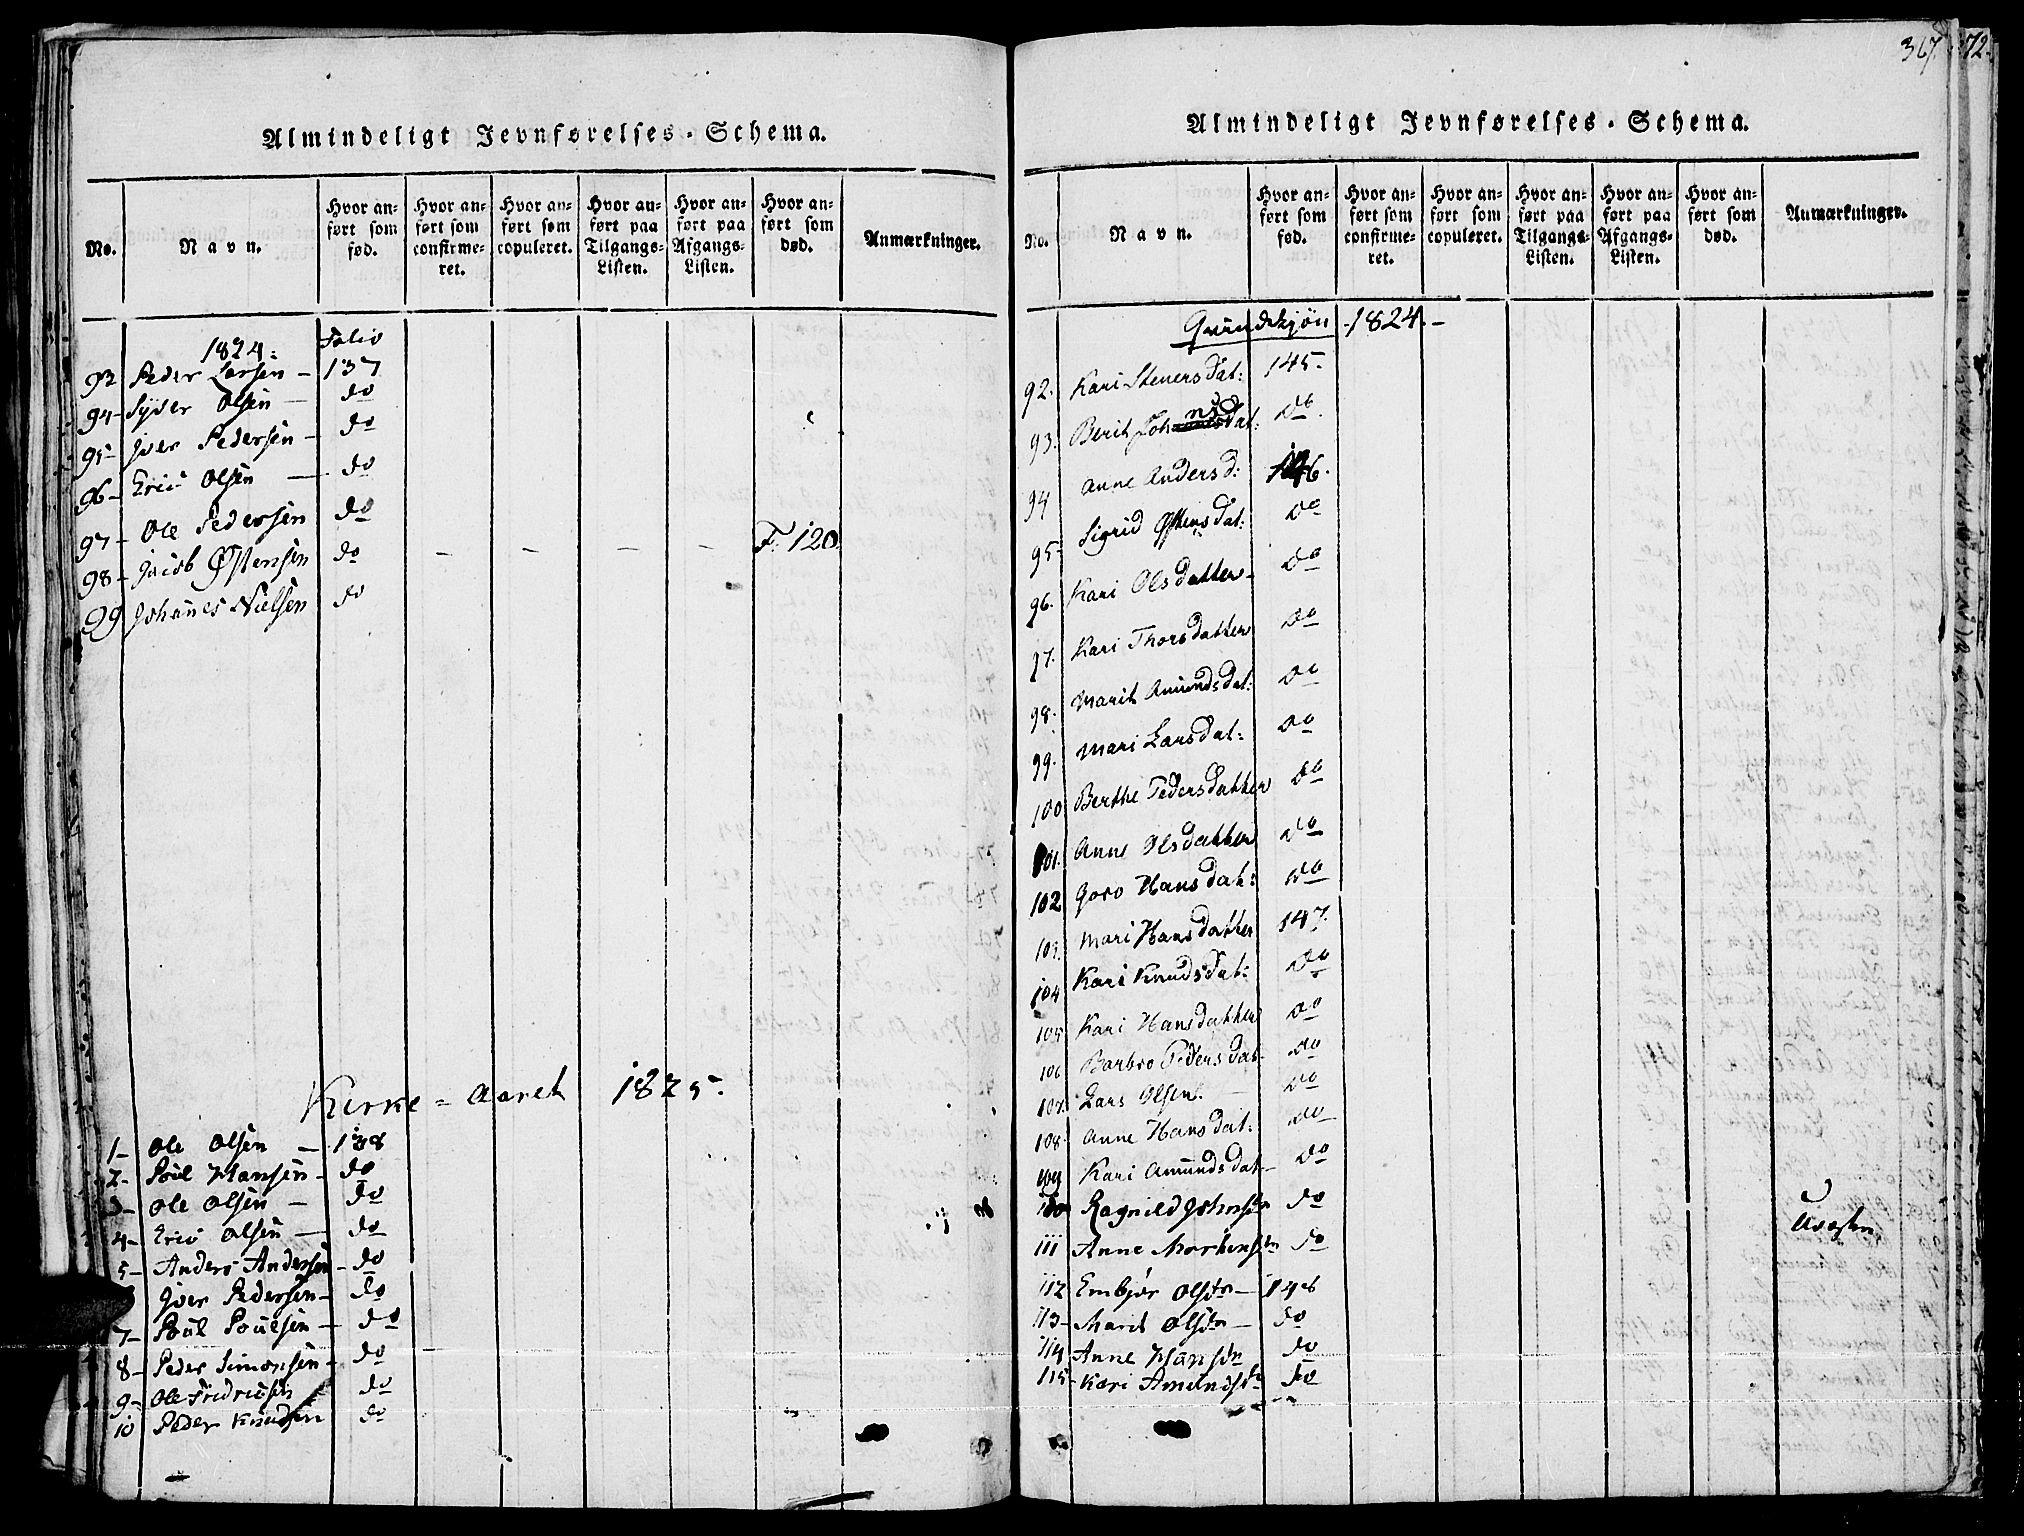 SAH, Fron prestekontor, H/Ha/Haa/L0002: Ministerialbok nr. 2, 1816-1827, s. 367